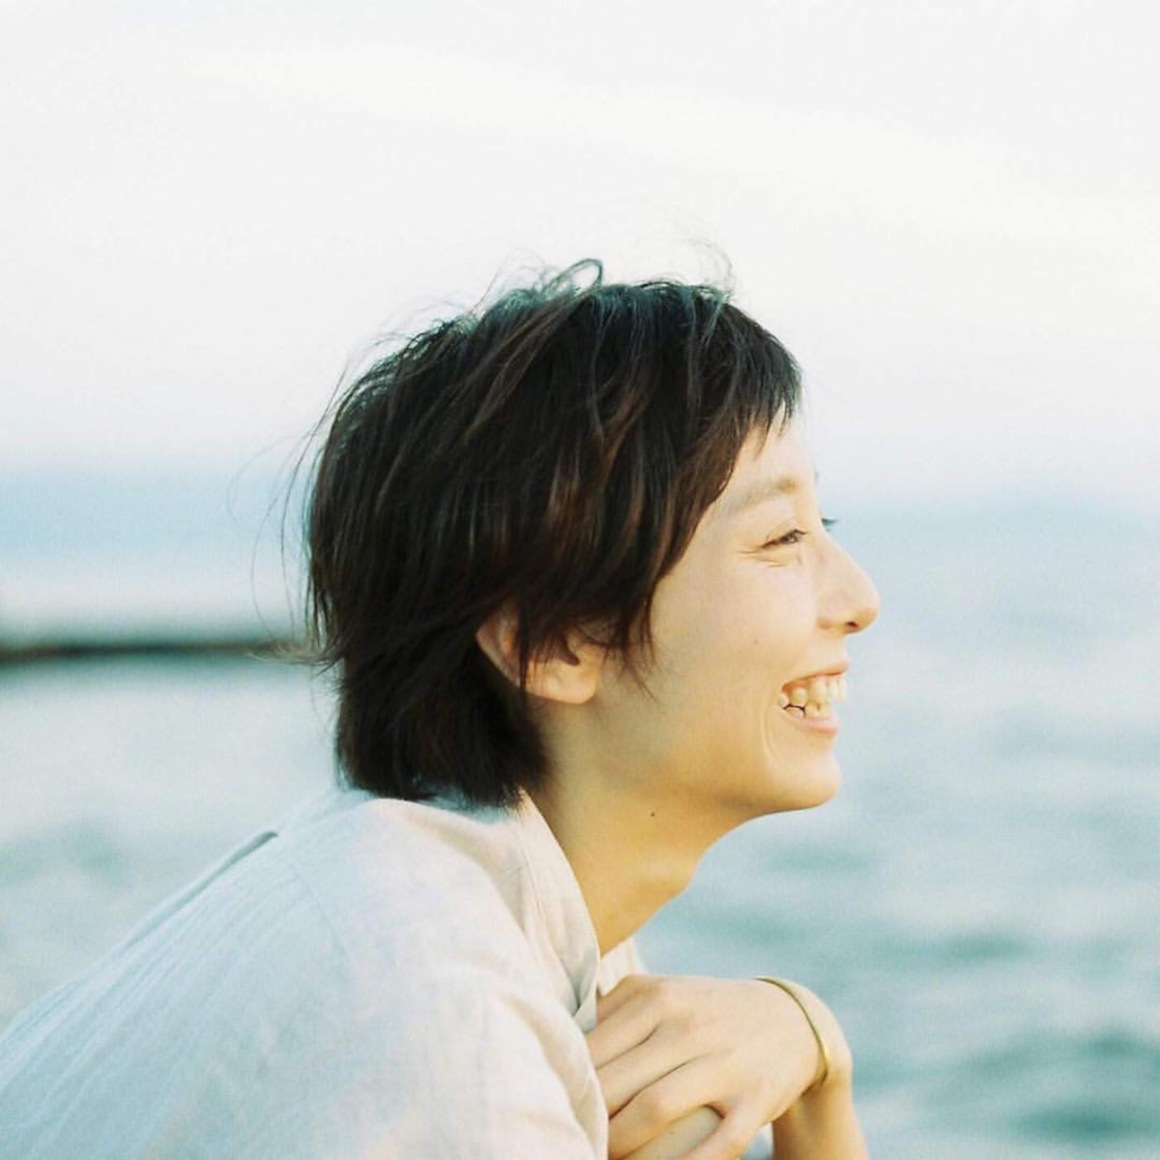 photo by @kouya_matsushita